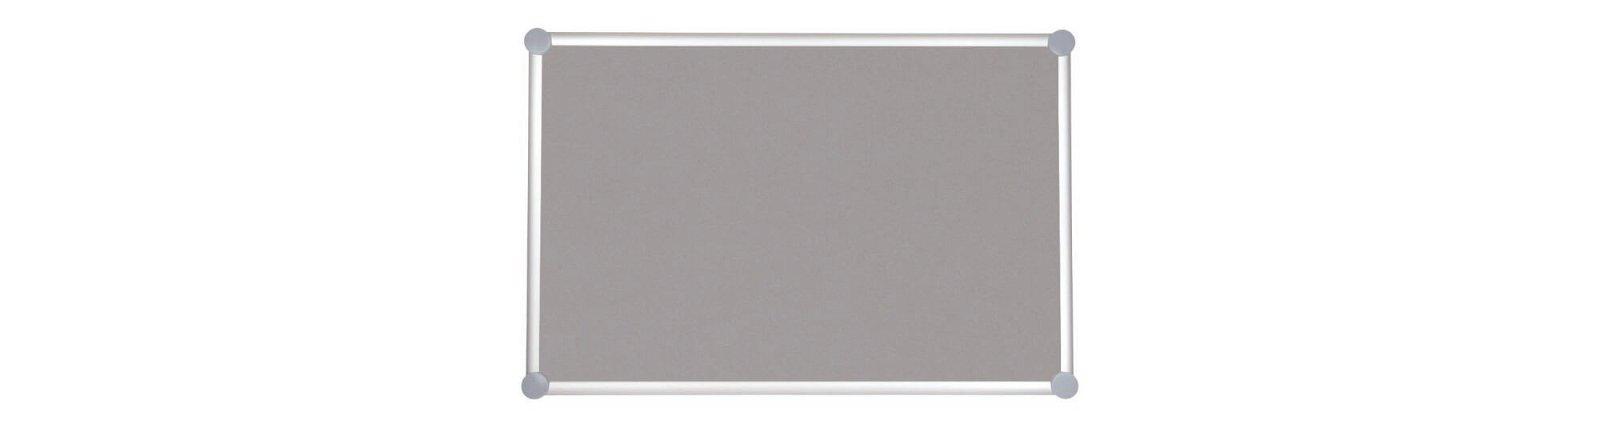 Pinnboard 2000 MAULpro, Textil, 60x90 cm, grau